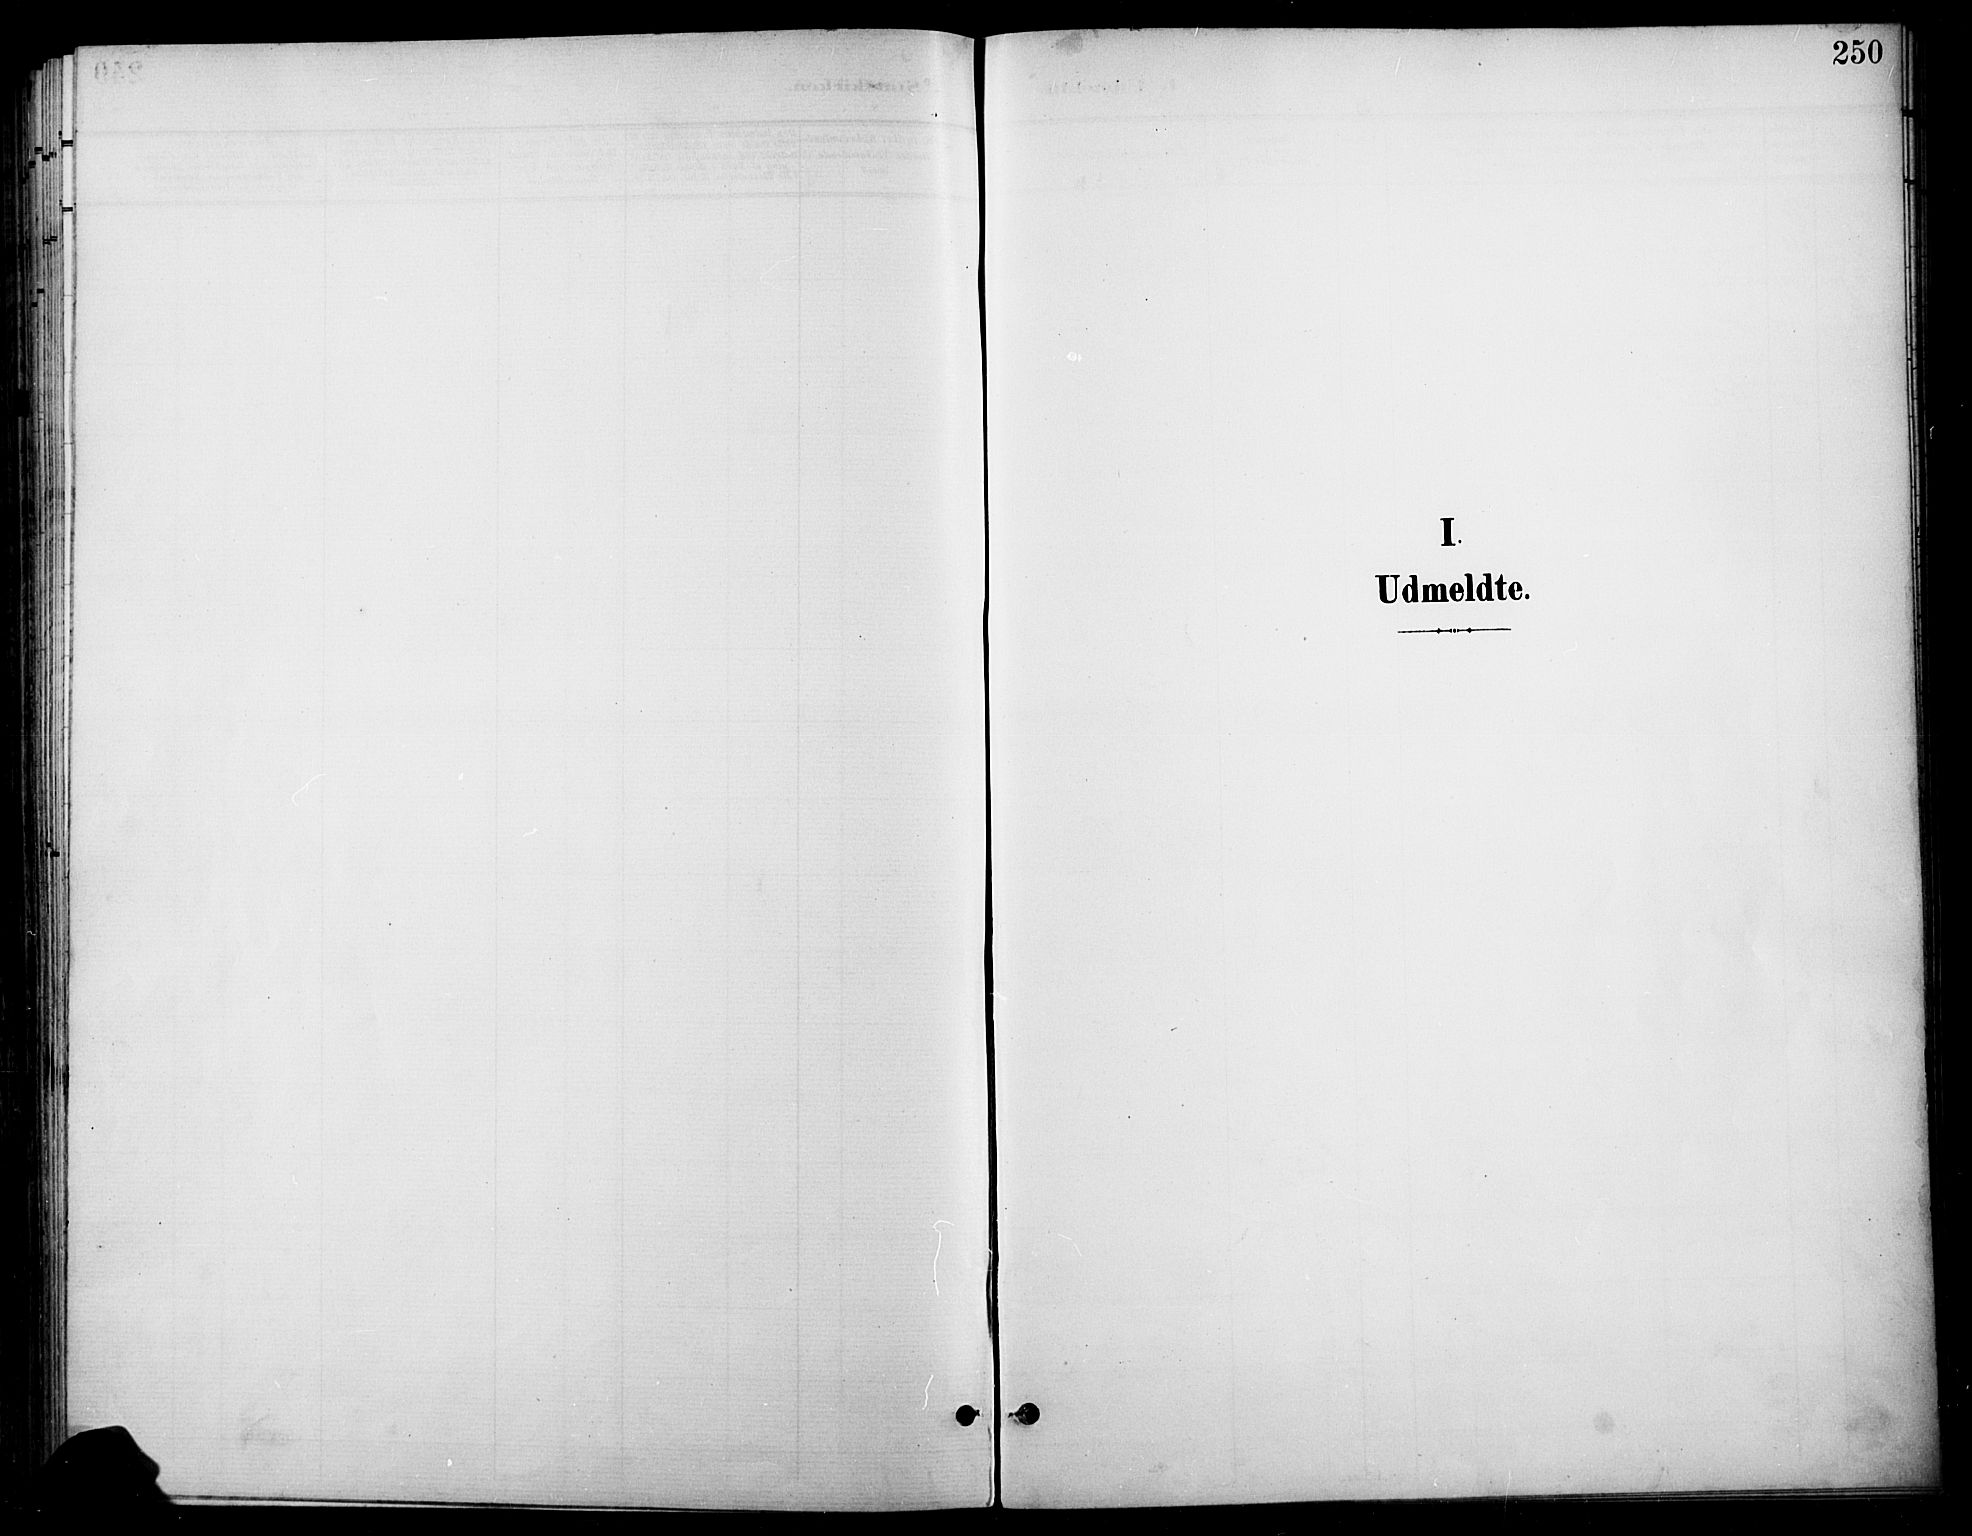 SAH, Gran prestekontor, Ministerialbok nr. 19, 1898-1907, s. 250